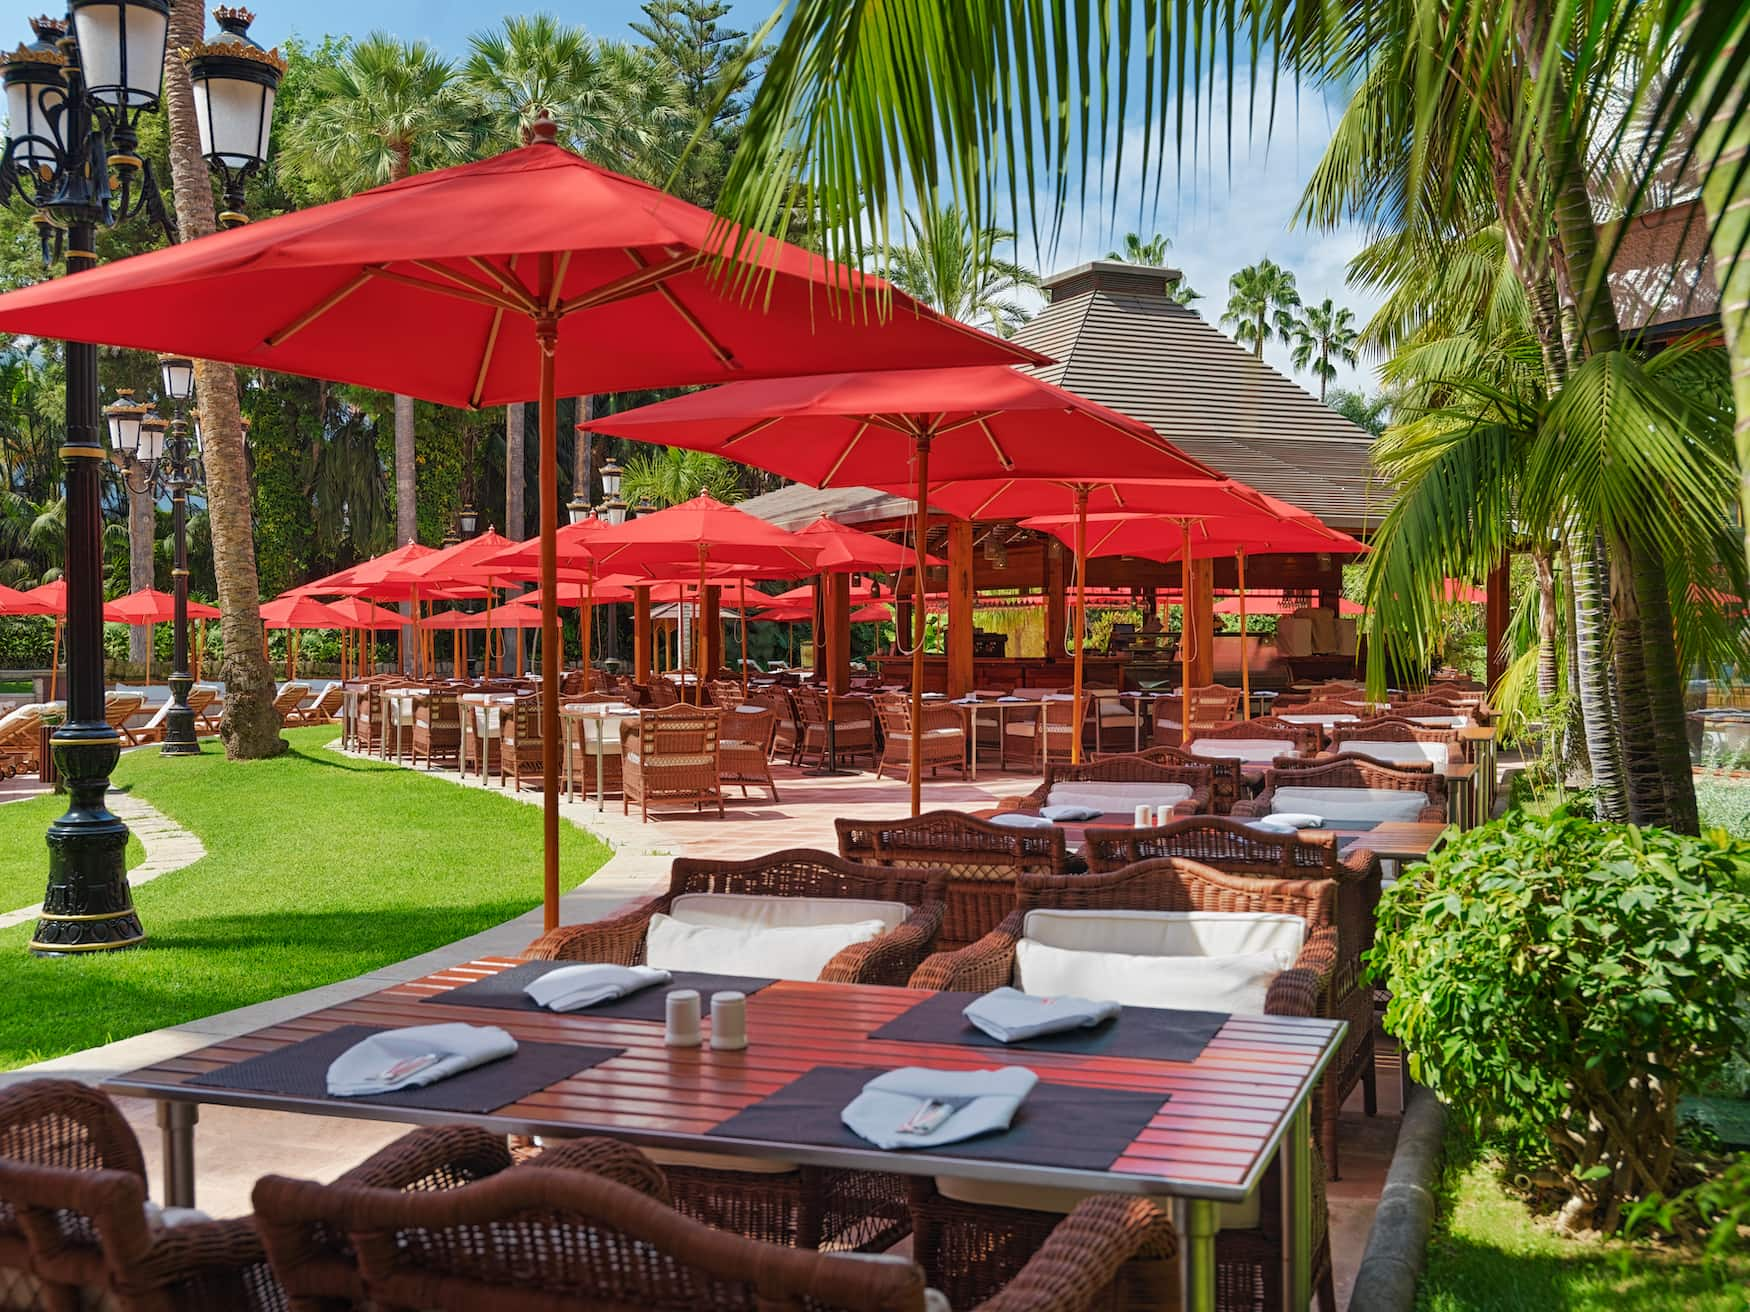 Palmera Real Restaurant im Hotel Botánico & The Oriental Spa Garden